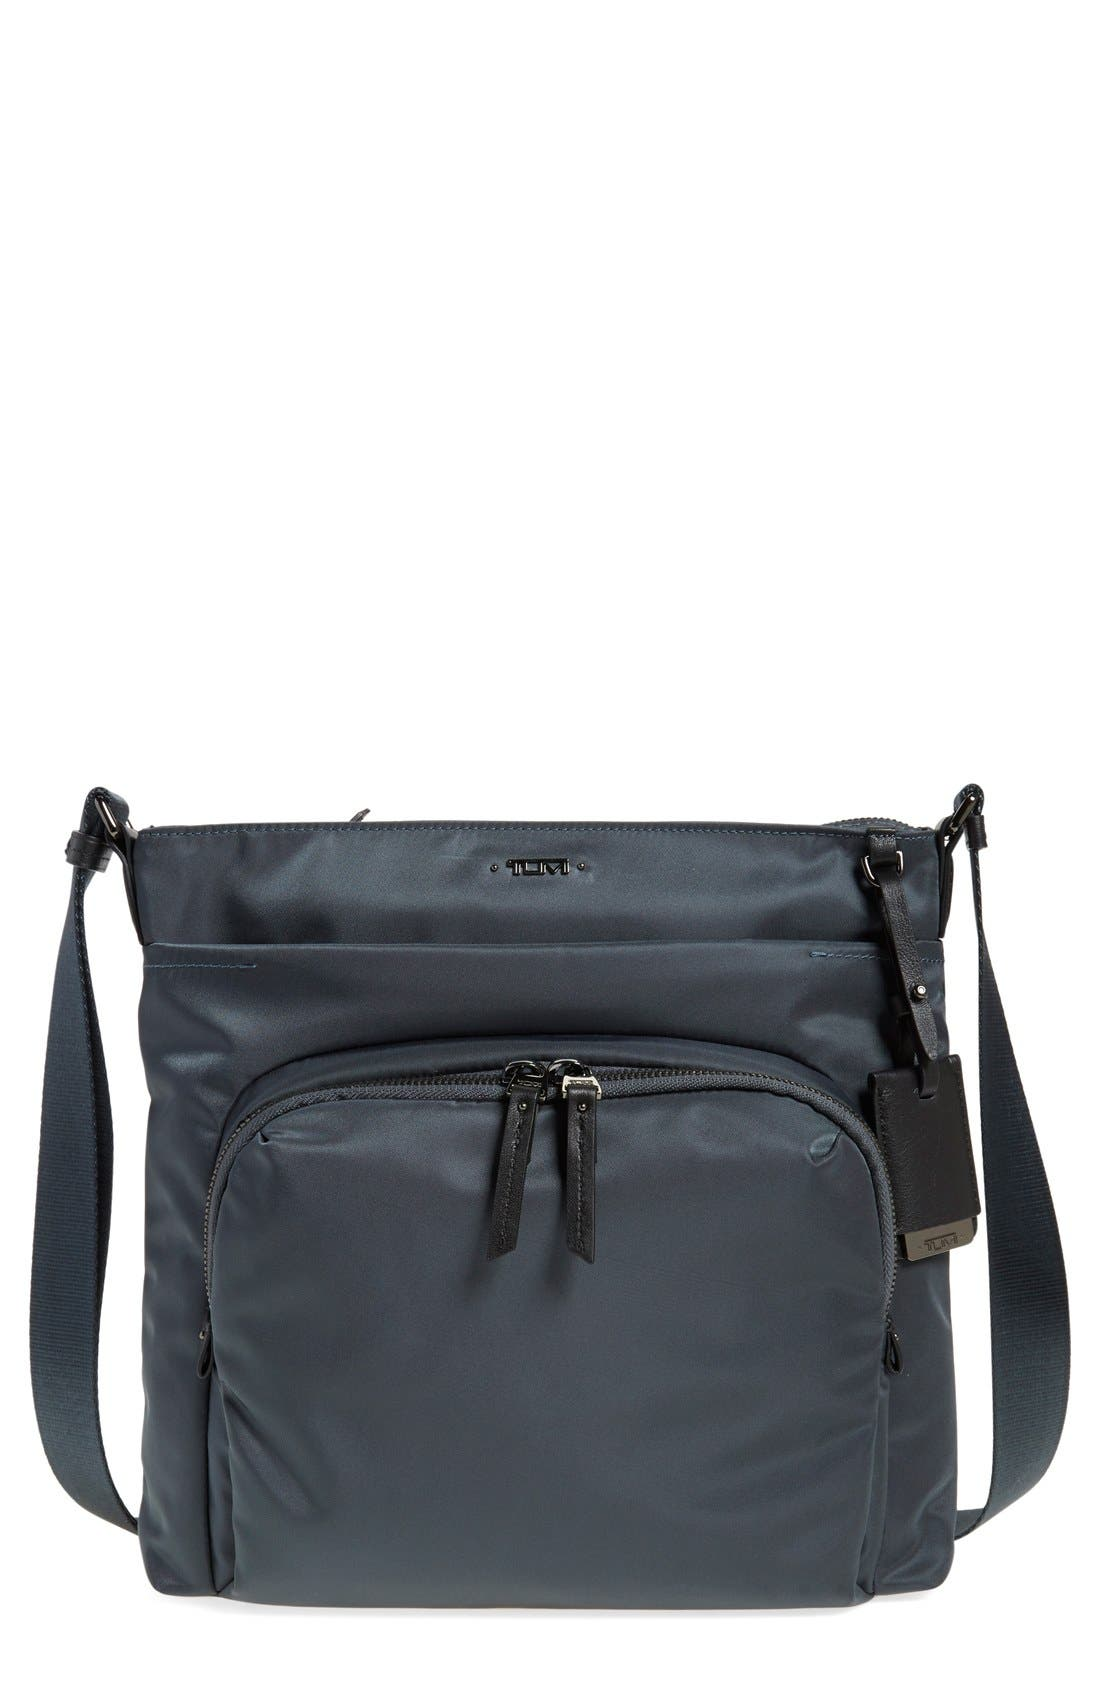 Tumi 'Voyageur - Capri' Crossbody Bag